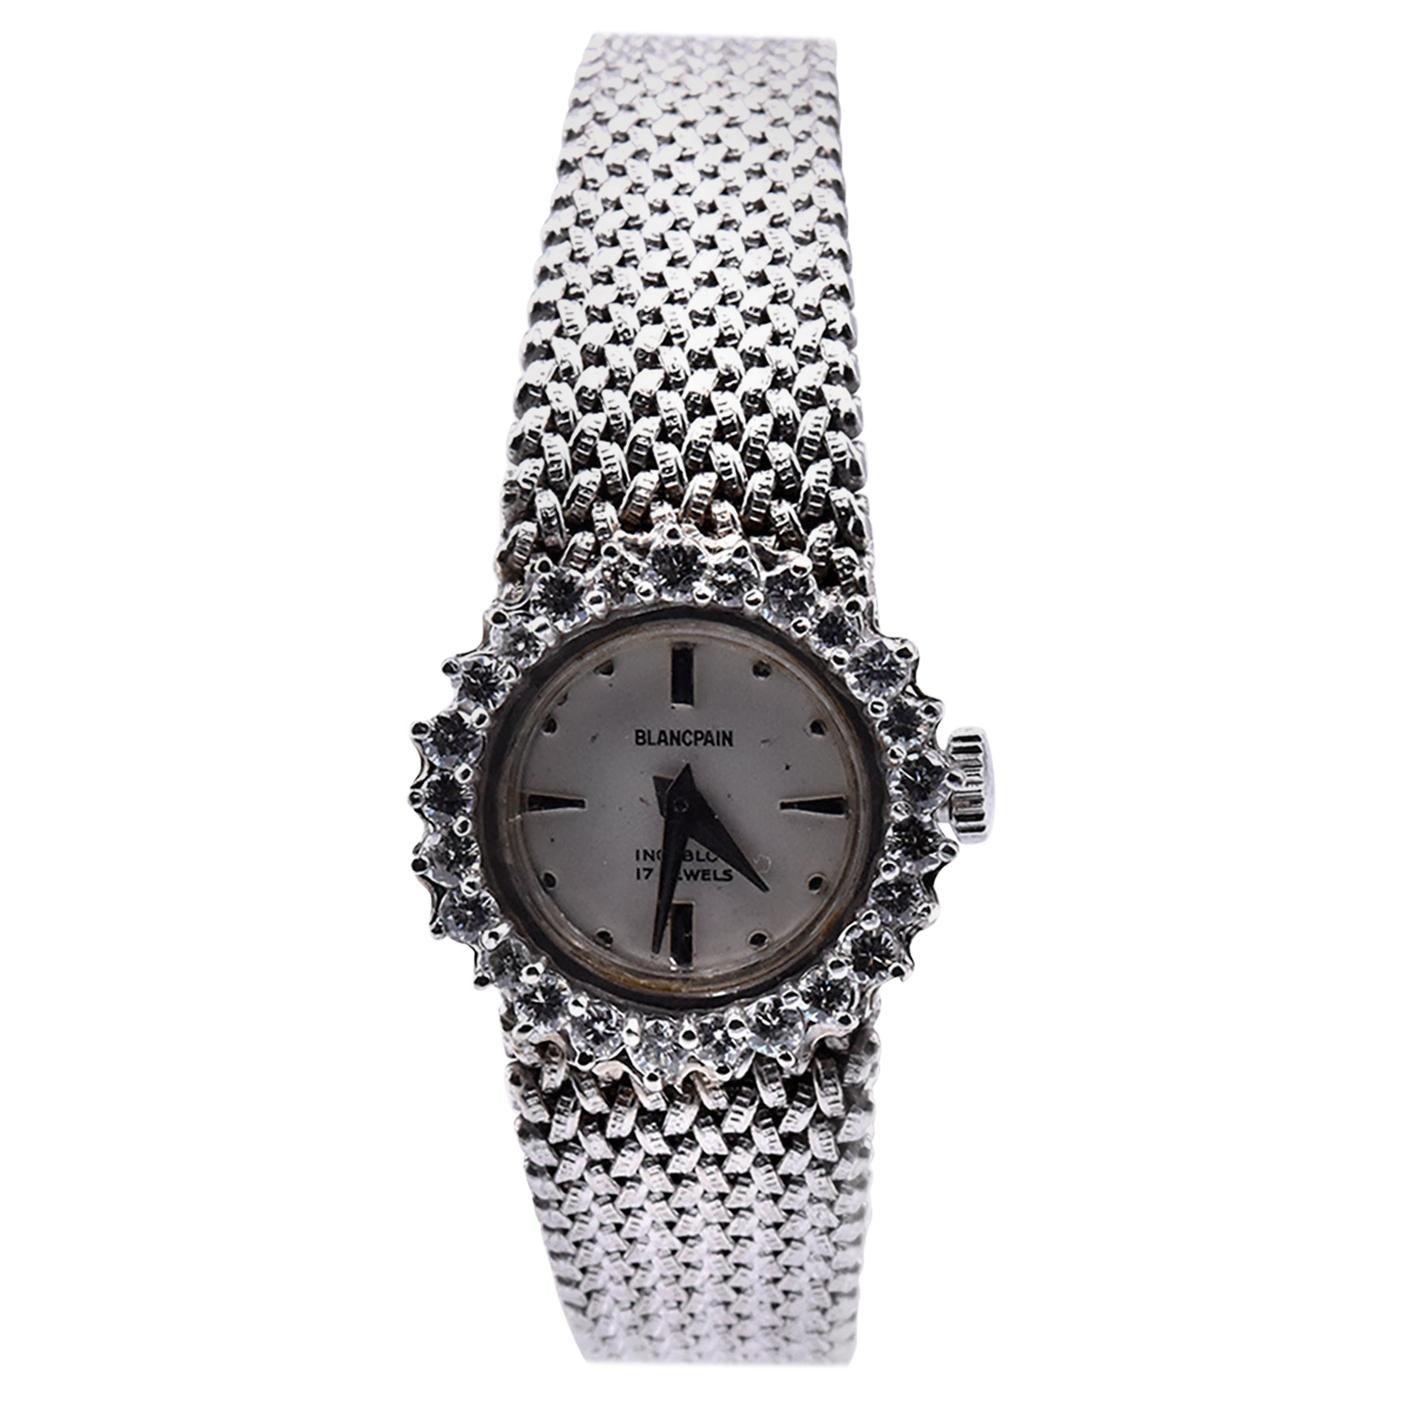 Blancpain Vintage 14 Karat White Gold & Diamond Ladies Watch with 18k Bracelet